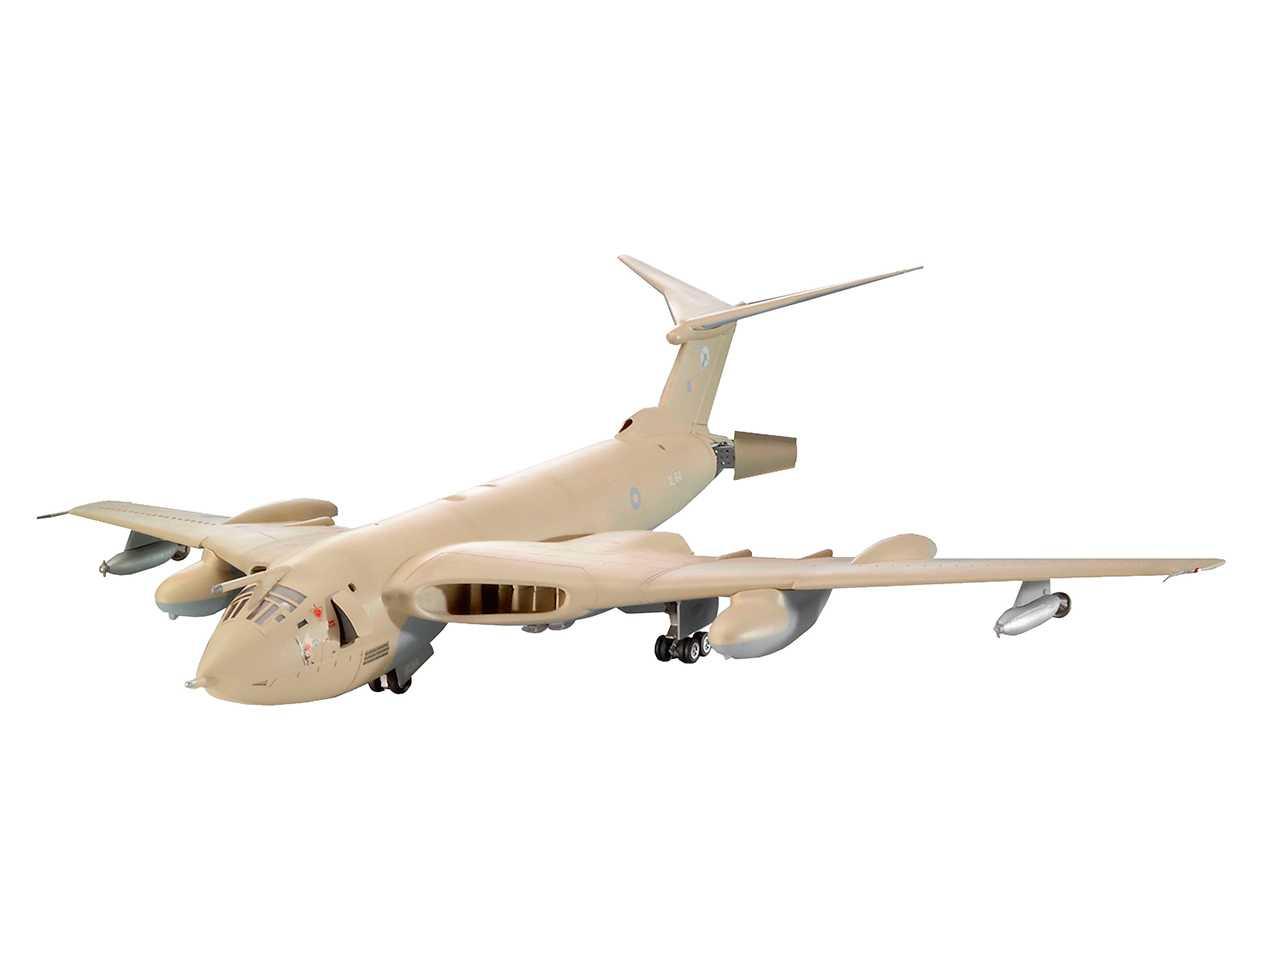 Plastic ModelKit letadlo 04326 - Handley Page Victor K.2 (1:72)